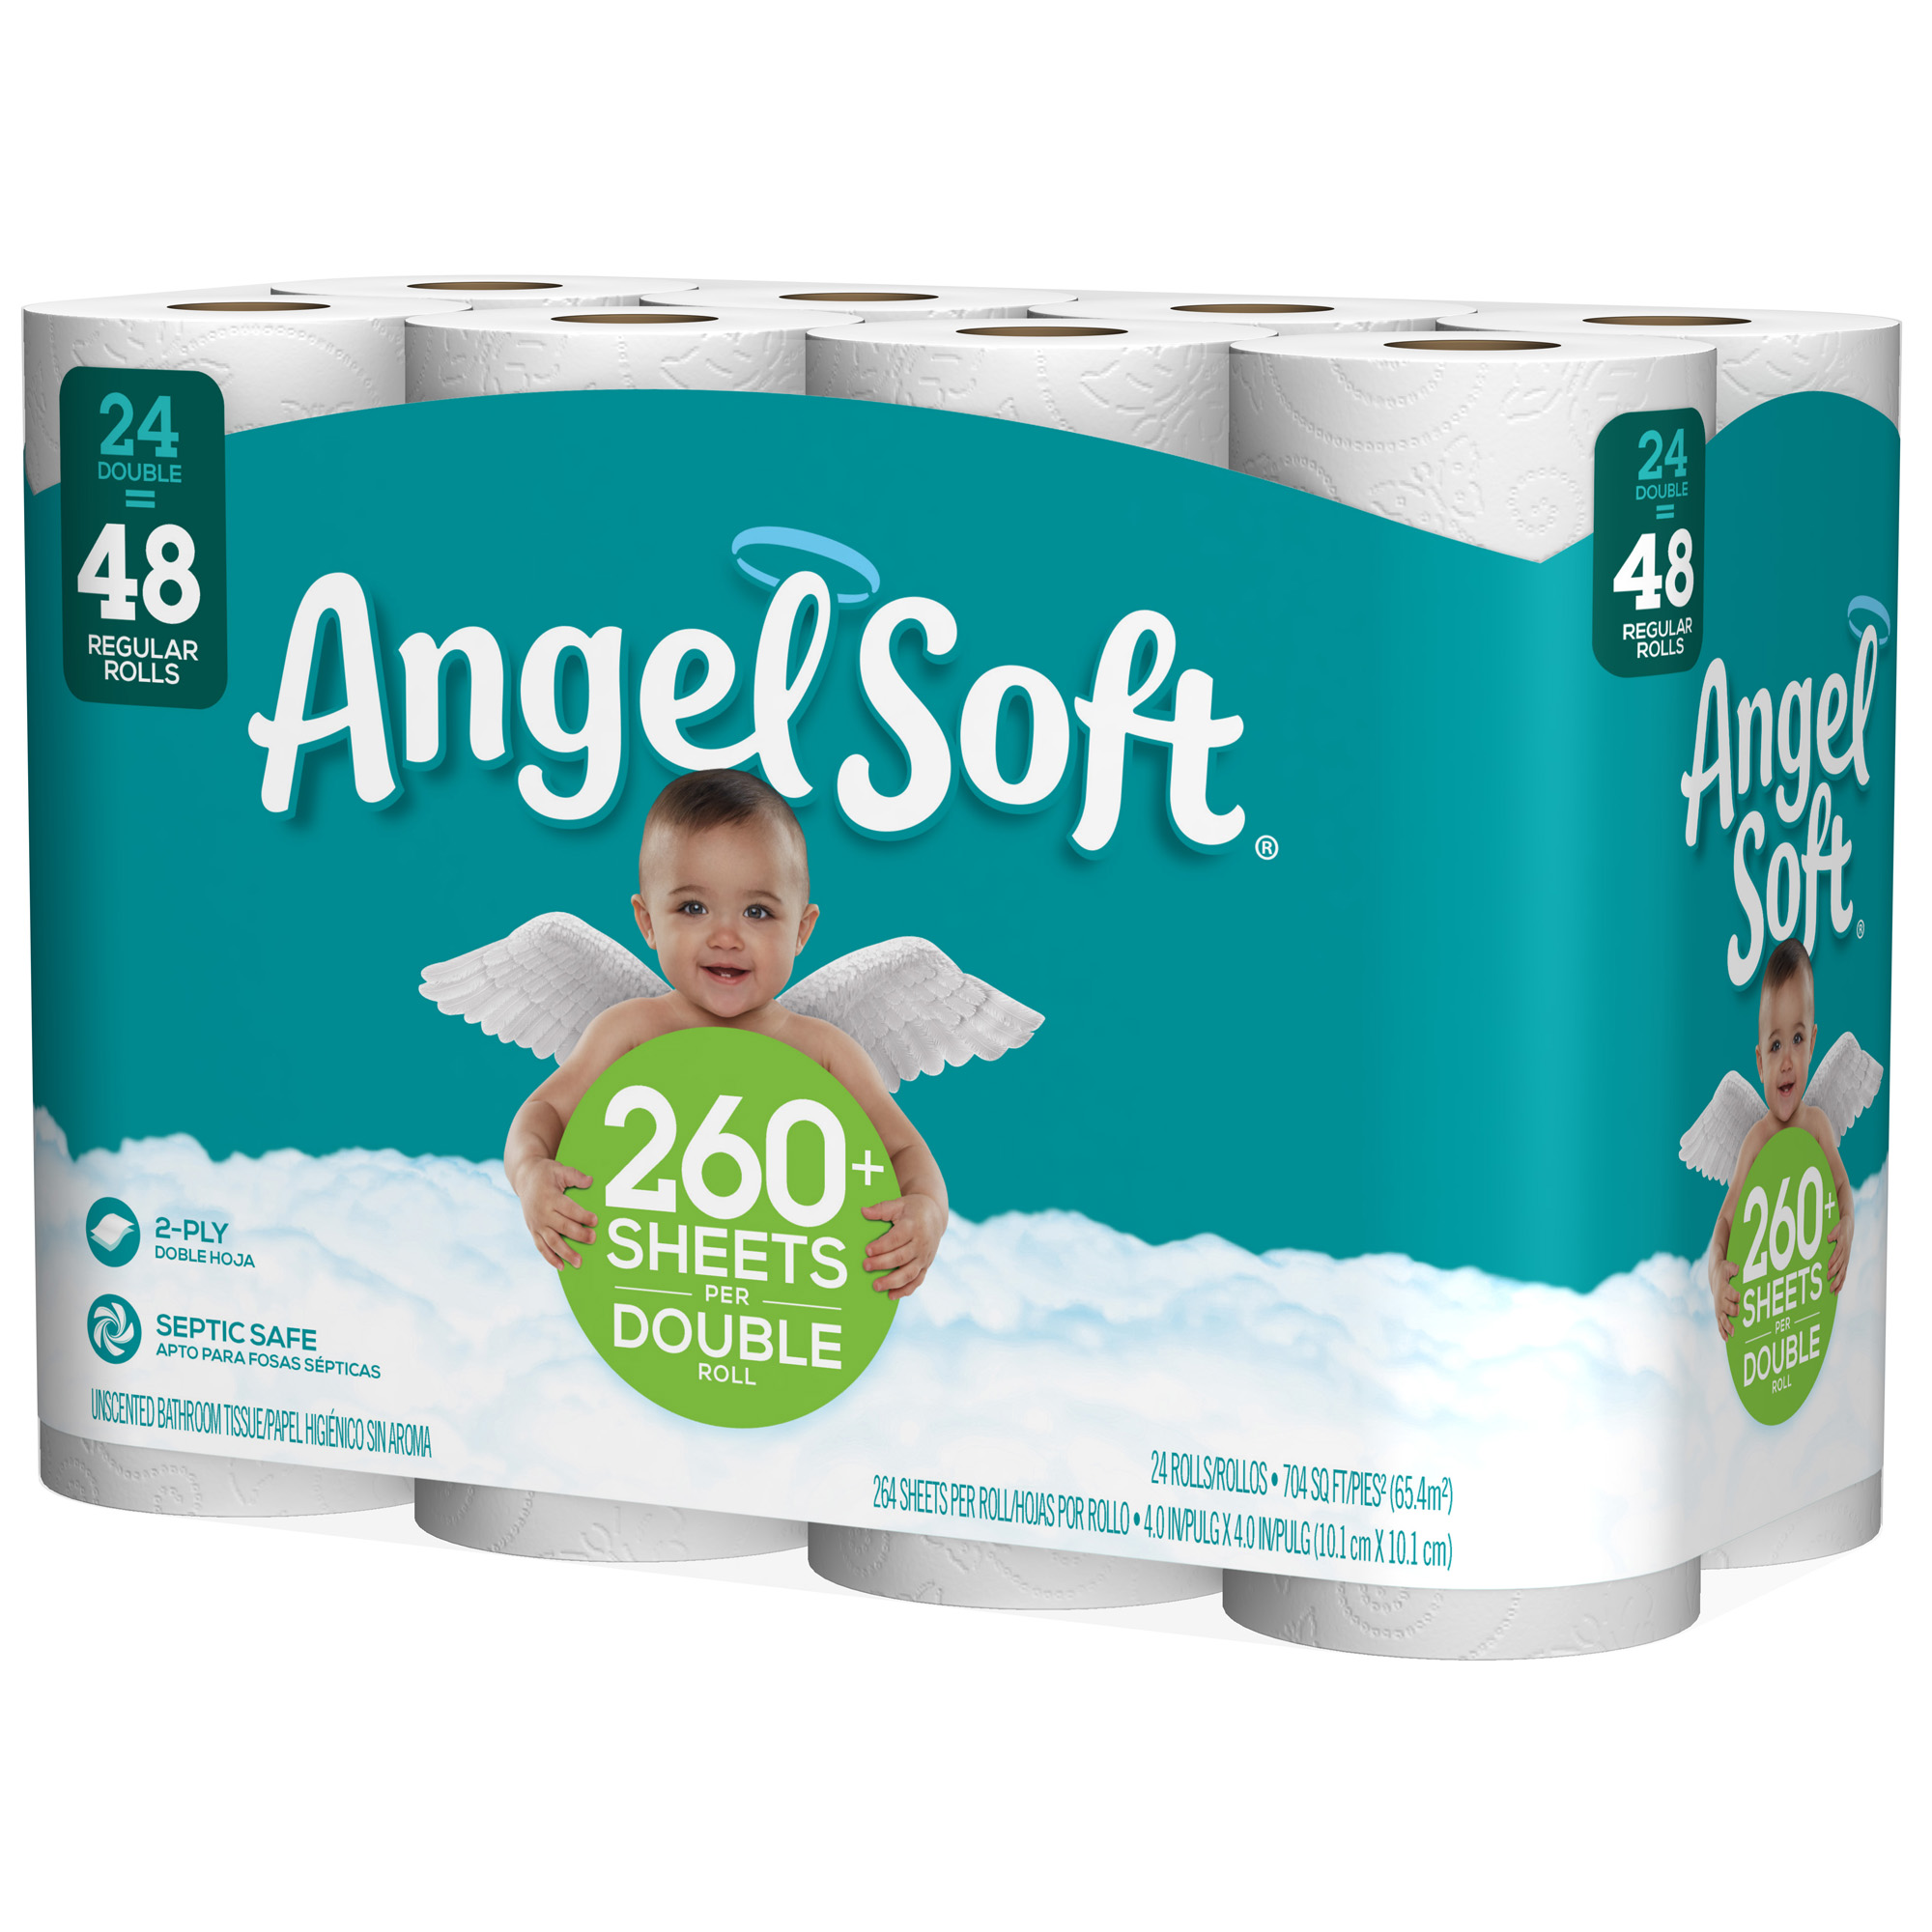 Angel Soft Bath Tissue 24 Double Rolls = 48 Regular Rolls